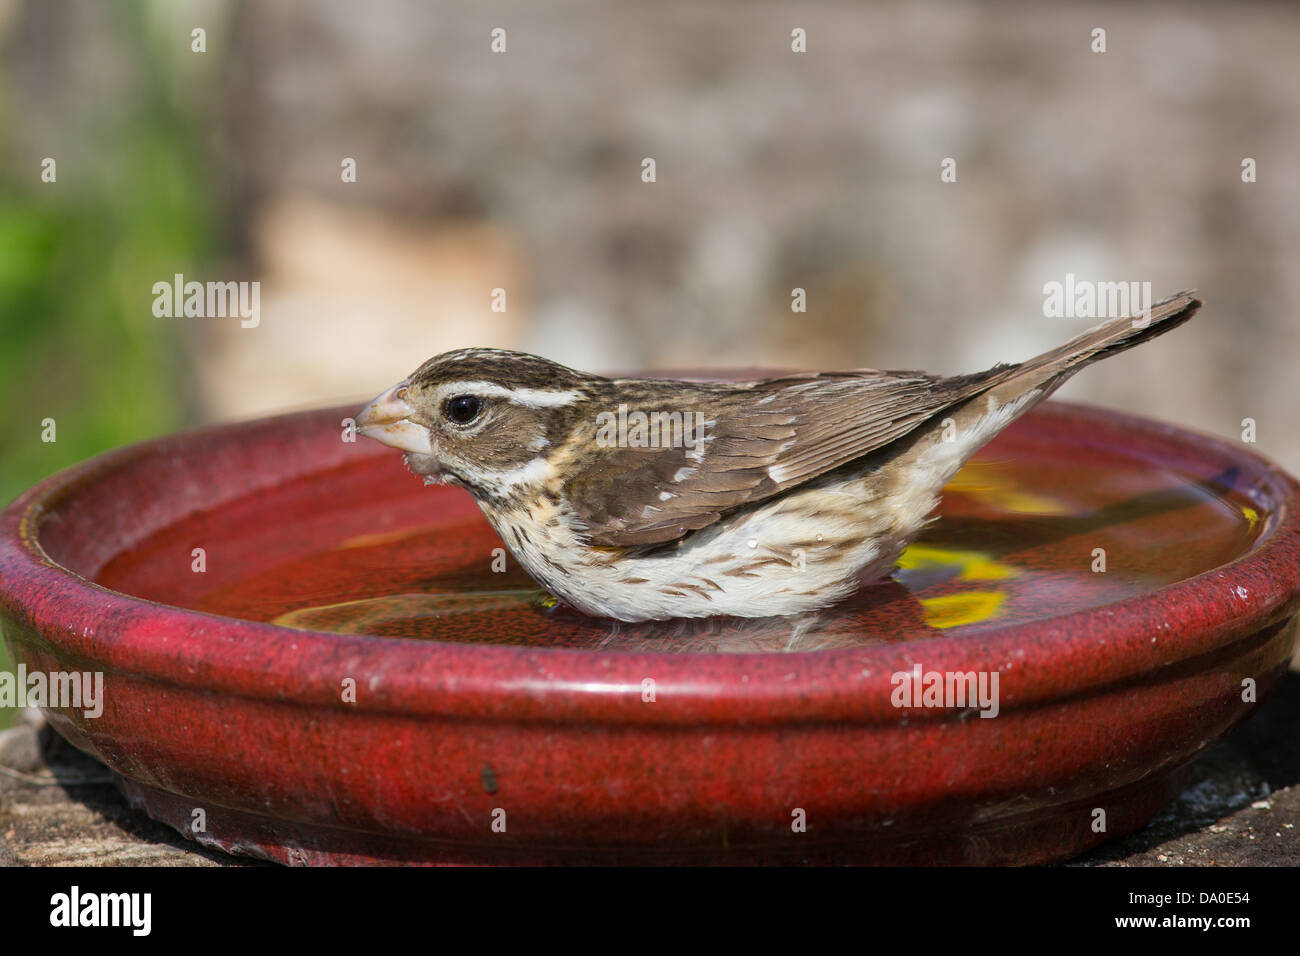 Vasca Da Bagno Rosa : Rosa femmina breasted grosbeak balneazione in un uccello rosso